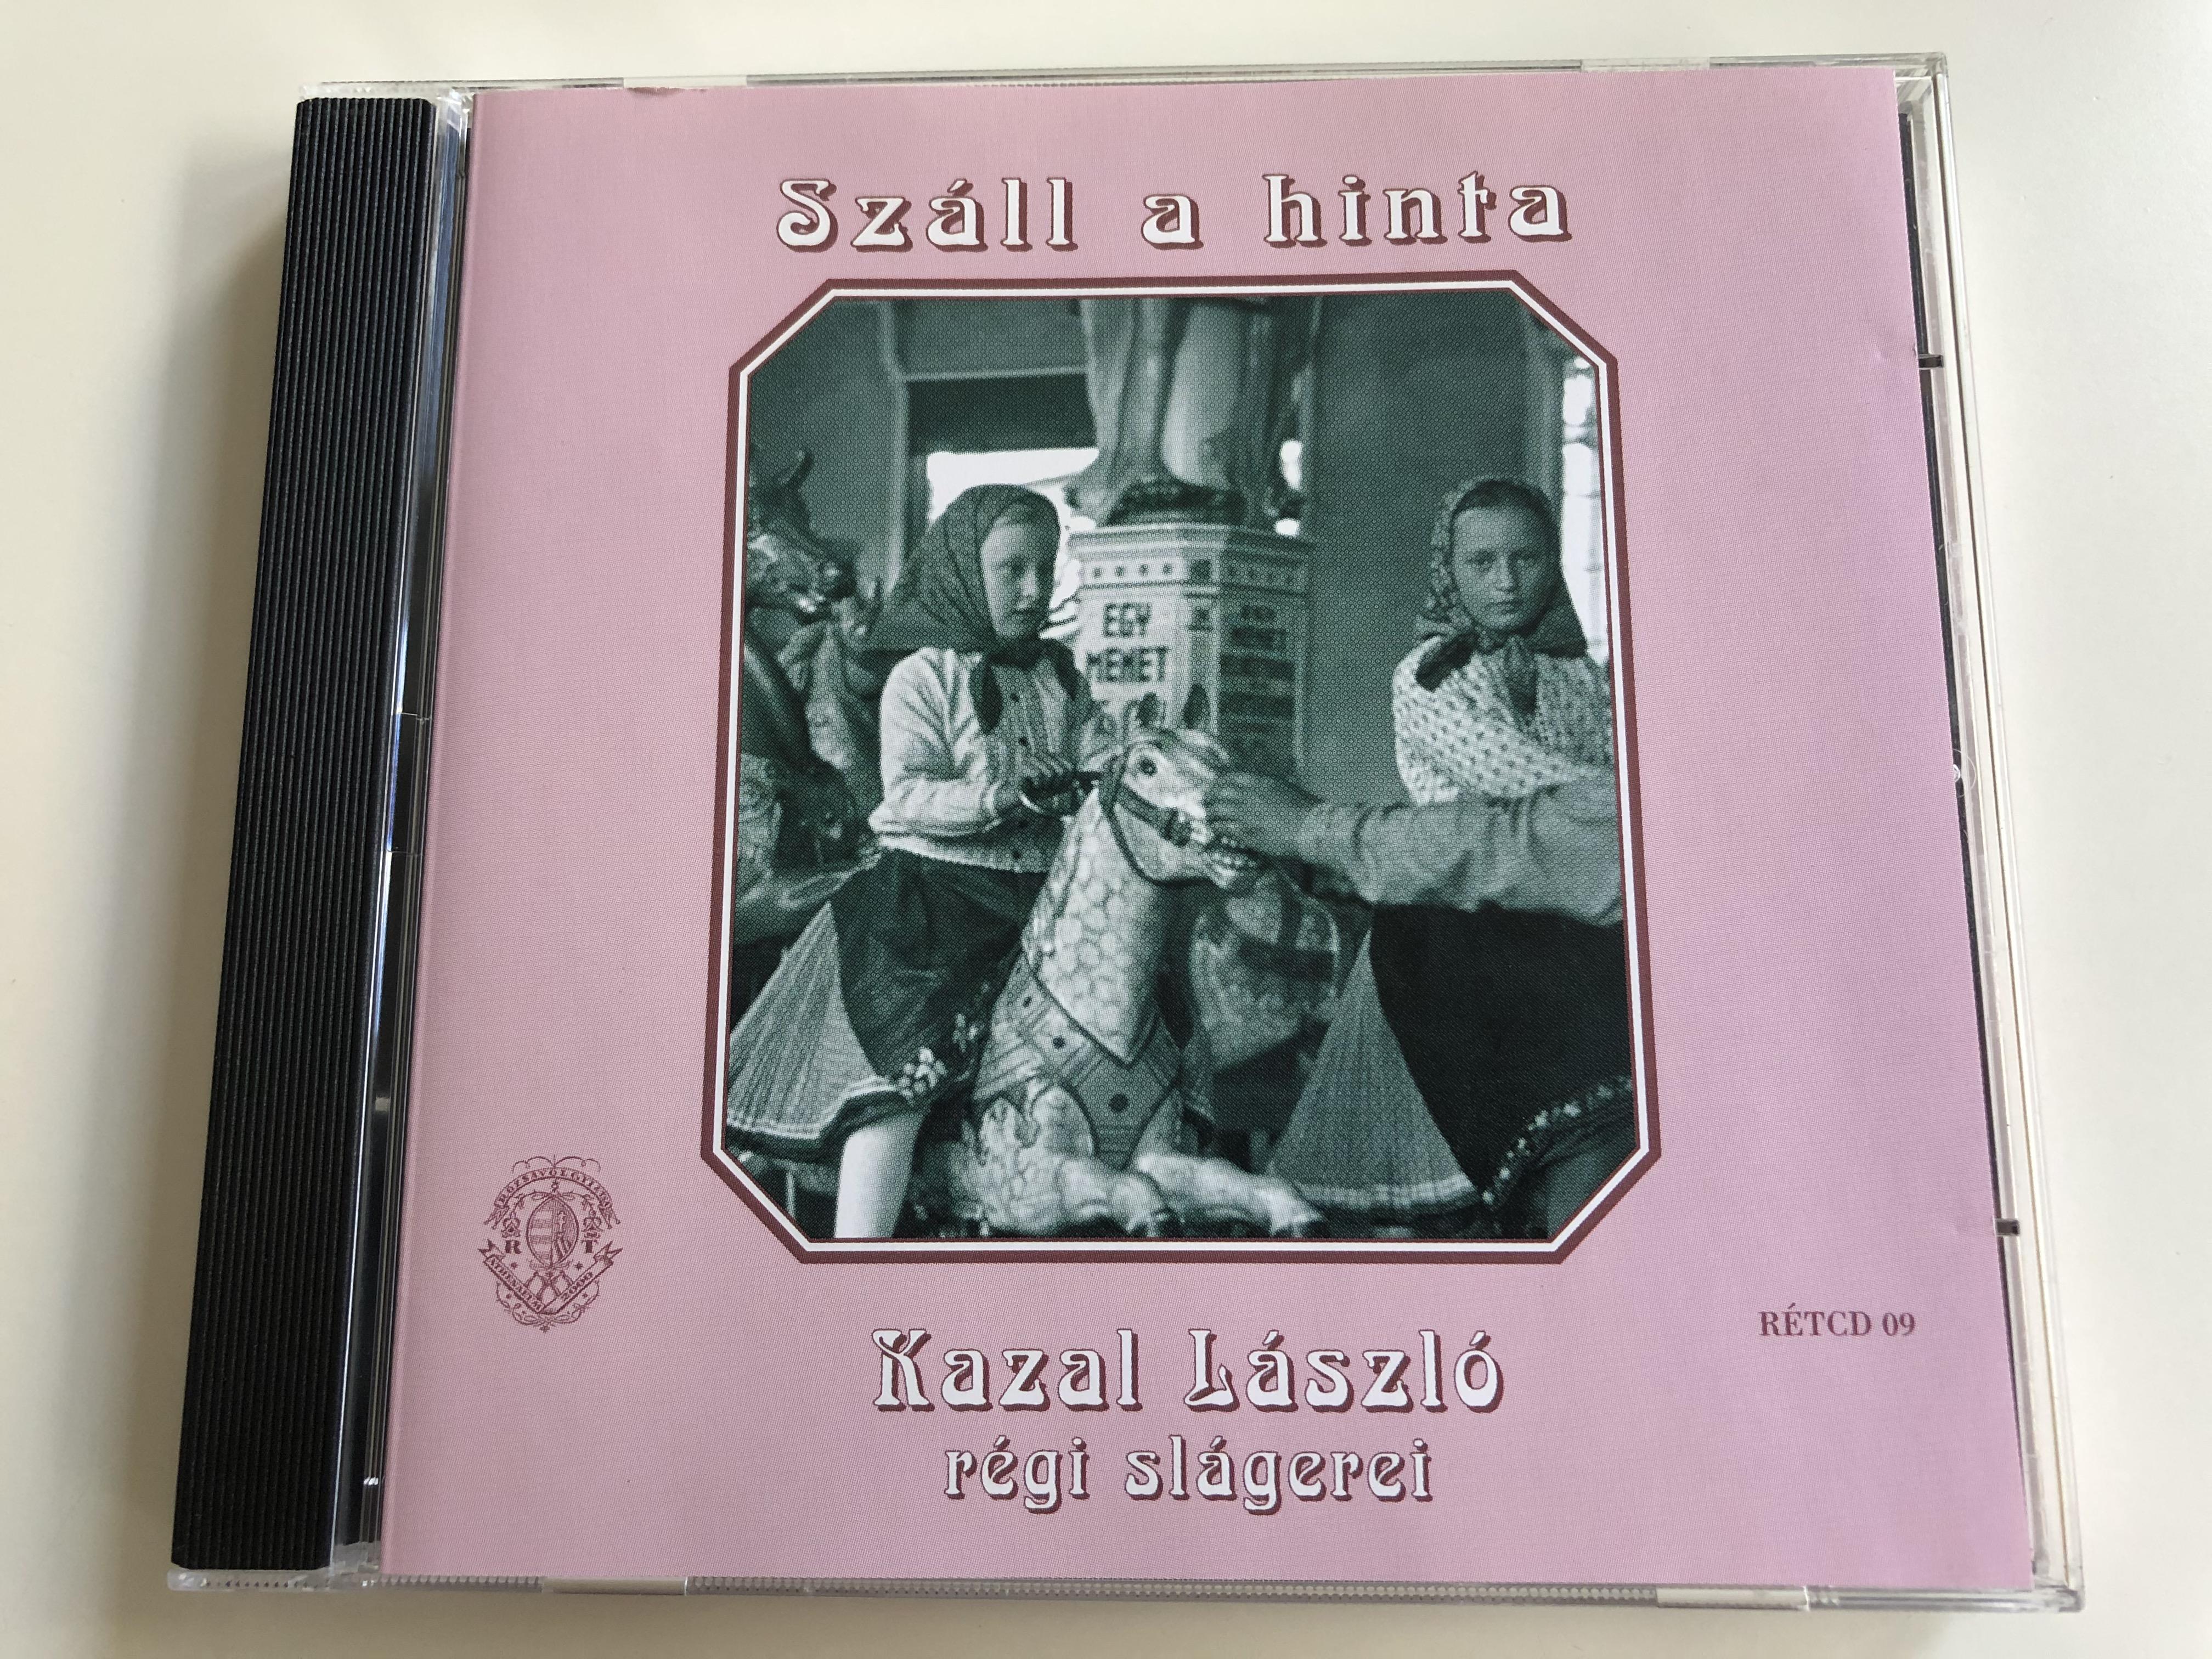 sz-ll-a-hinta-kazal-l-szl-regi-slagerei-r-zsav-lgyi-s-t-rsa-audio-cd-2000-mono-r-tcd-09-1-.jpg